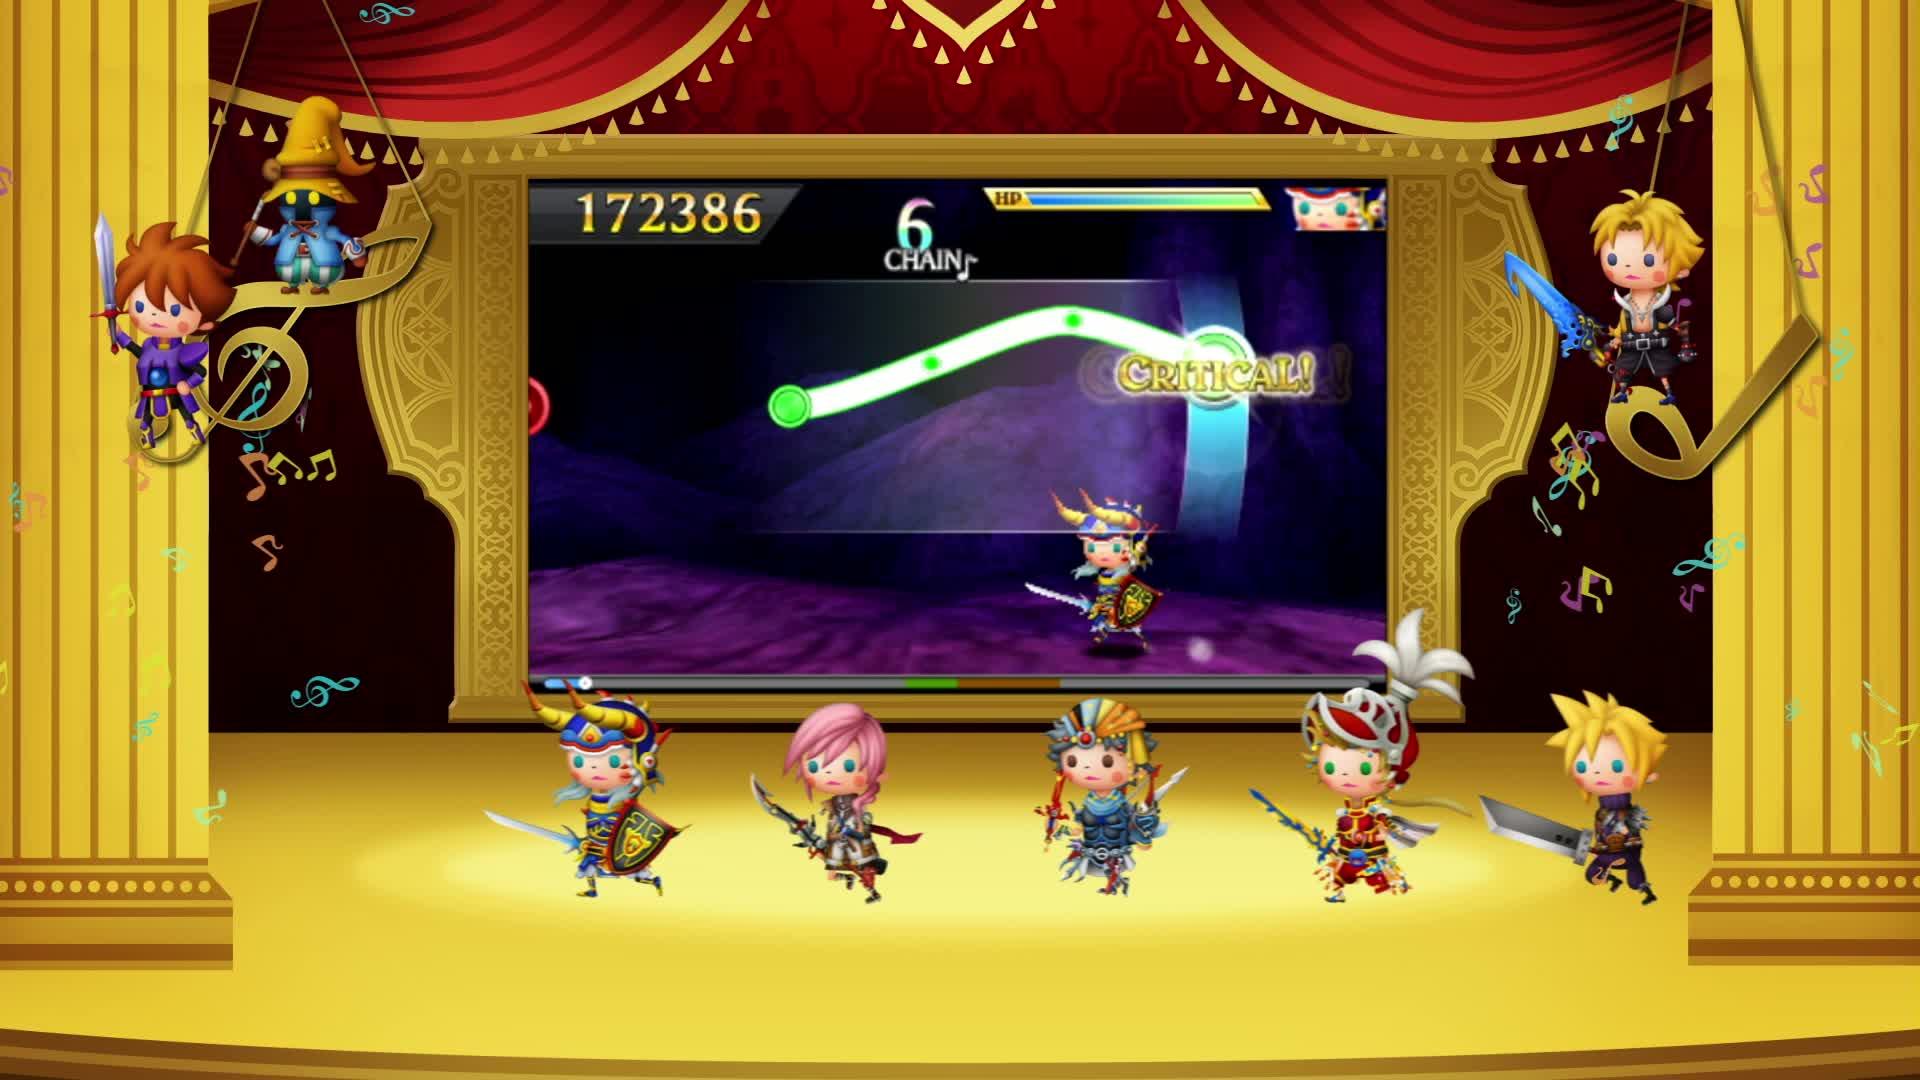 Theatrhythm Final Fantasy: Curtain Call  Videos and Trailers